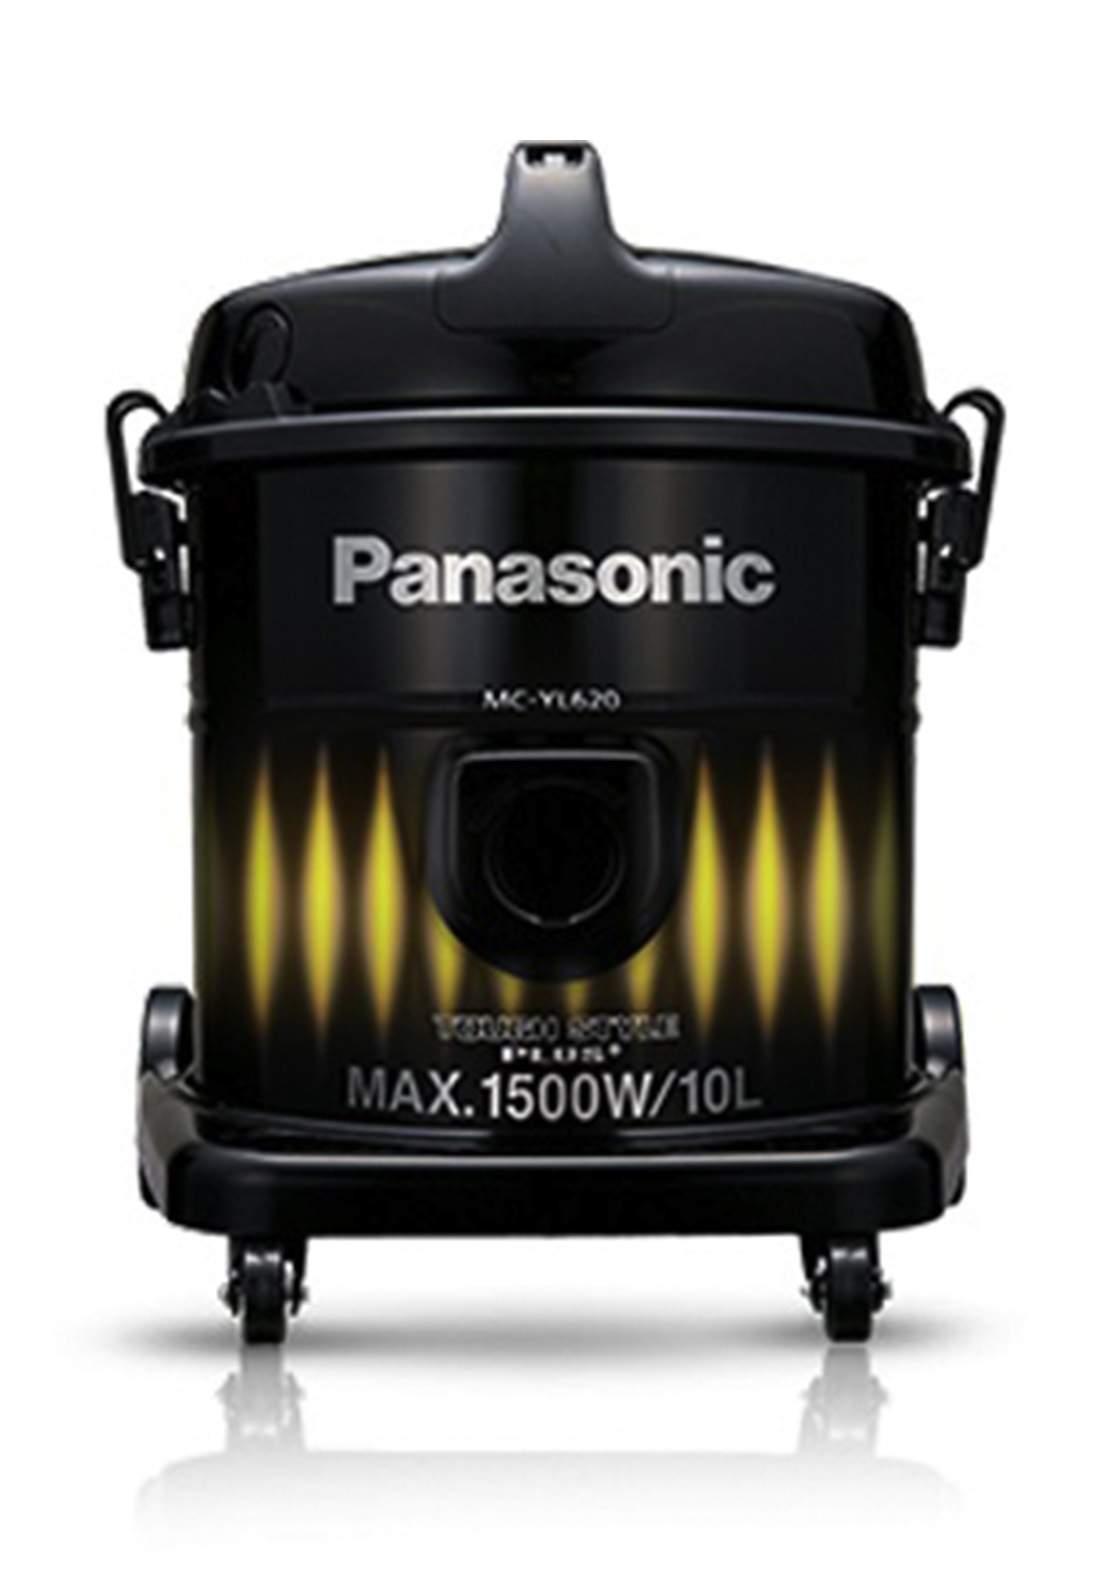 Panasonic  MC-YL620 Vacuum Cleaner  1500W مكنسة